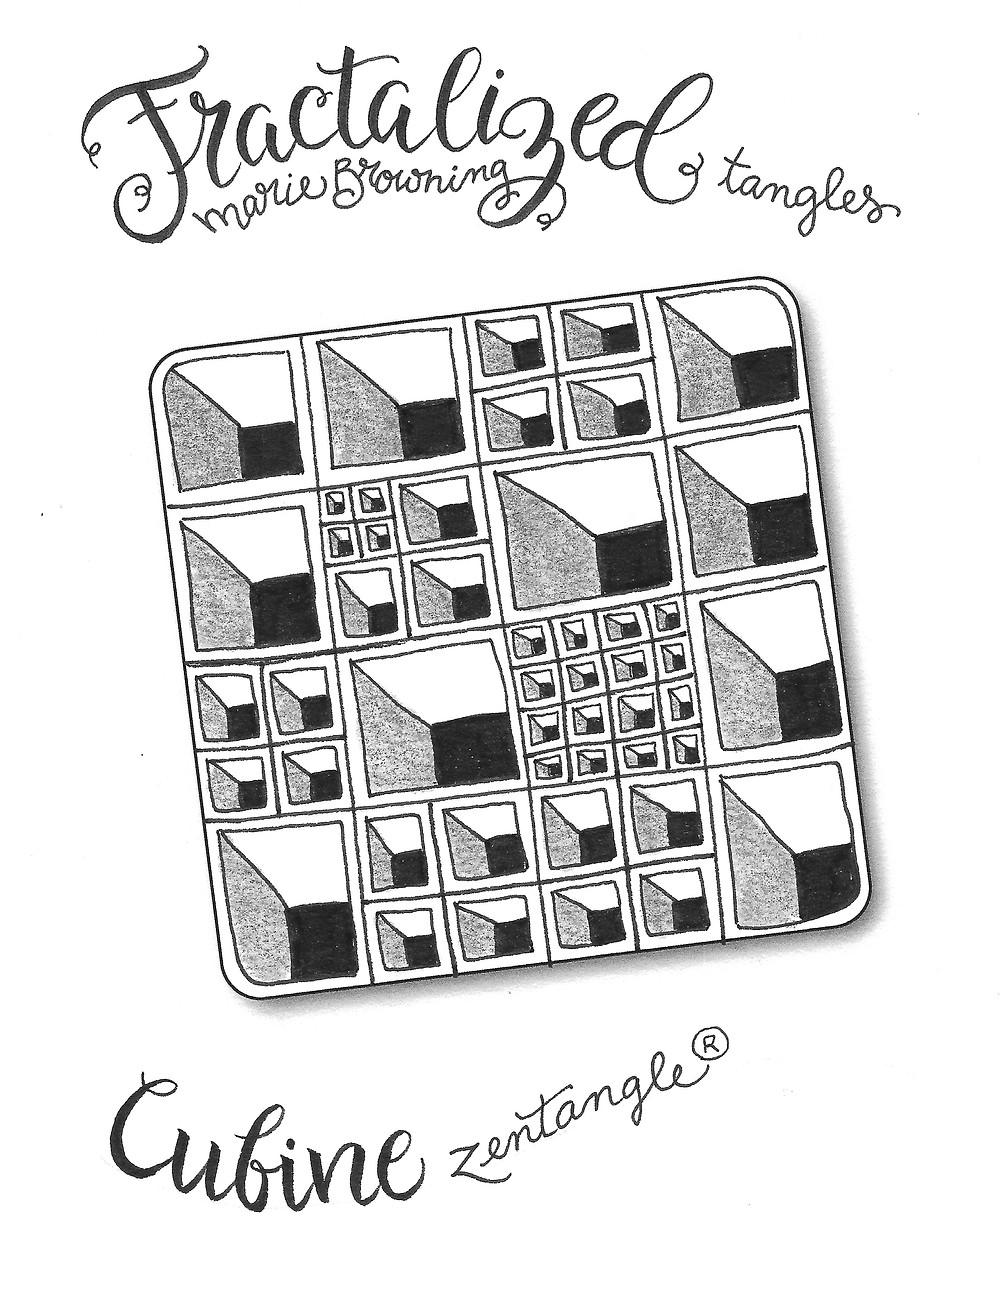 @mariebcreates #tombow #zenart #fractalart  drawing of Cubine Zentangle